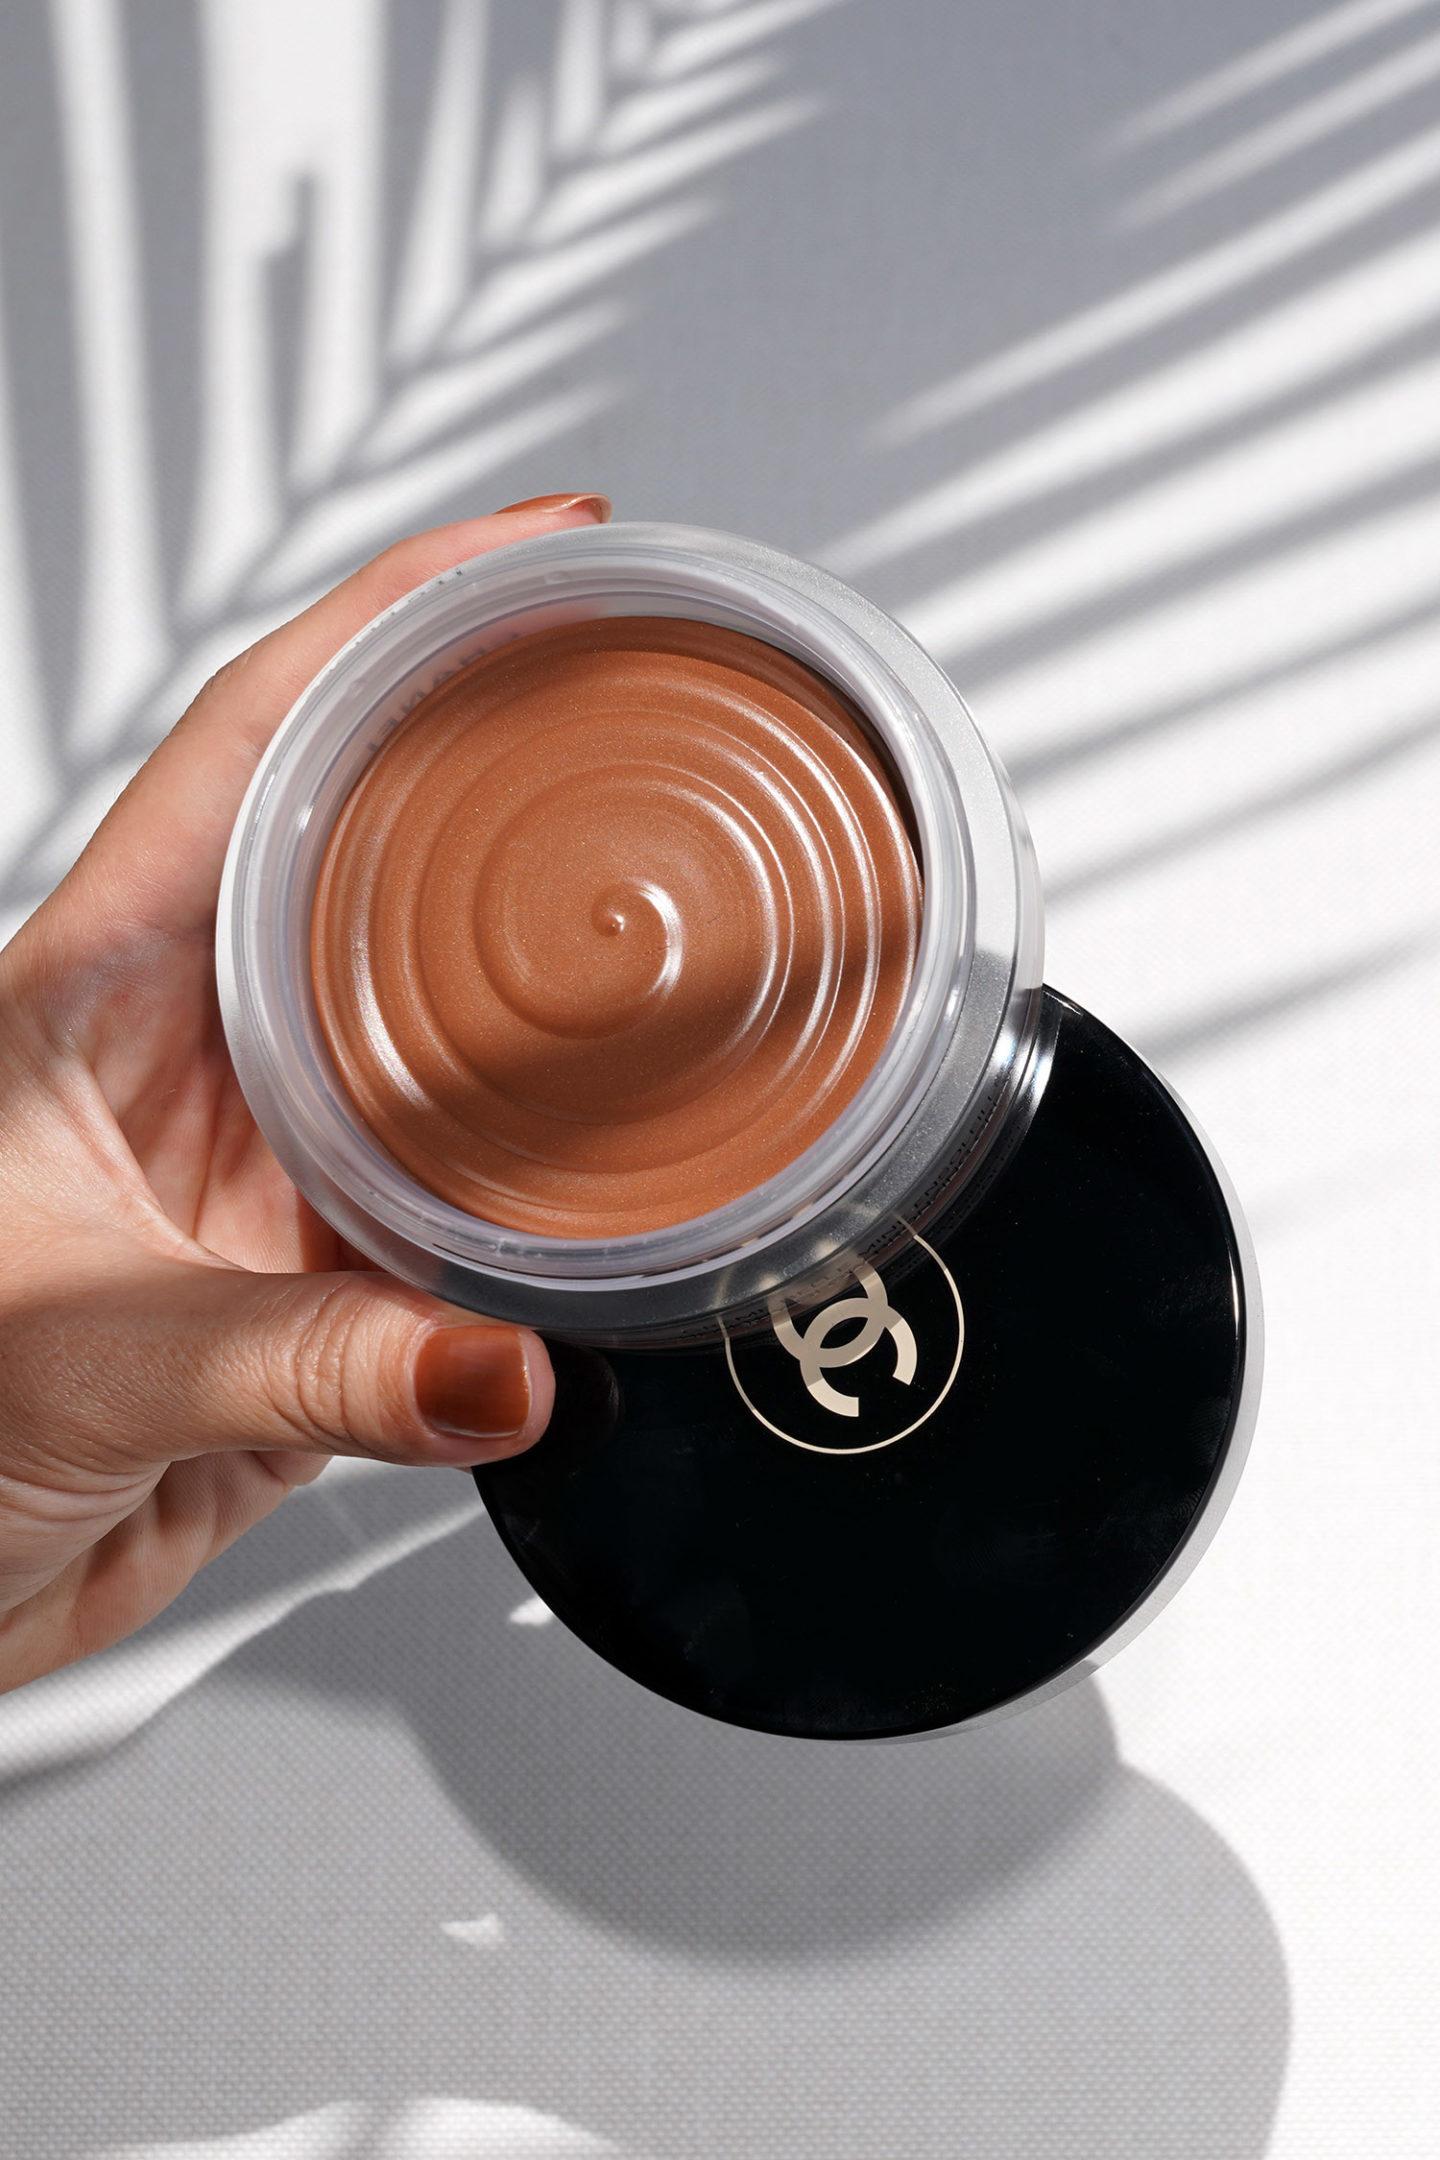 Chanel Les Beiges Healthy Glow Bronzing Cream in 395 Soleil Tan Deep Bronze